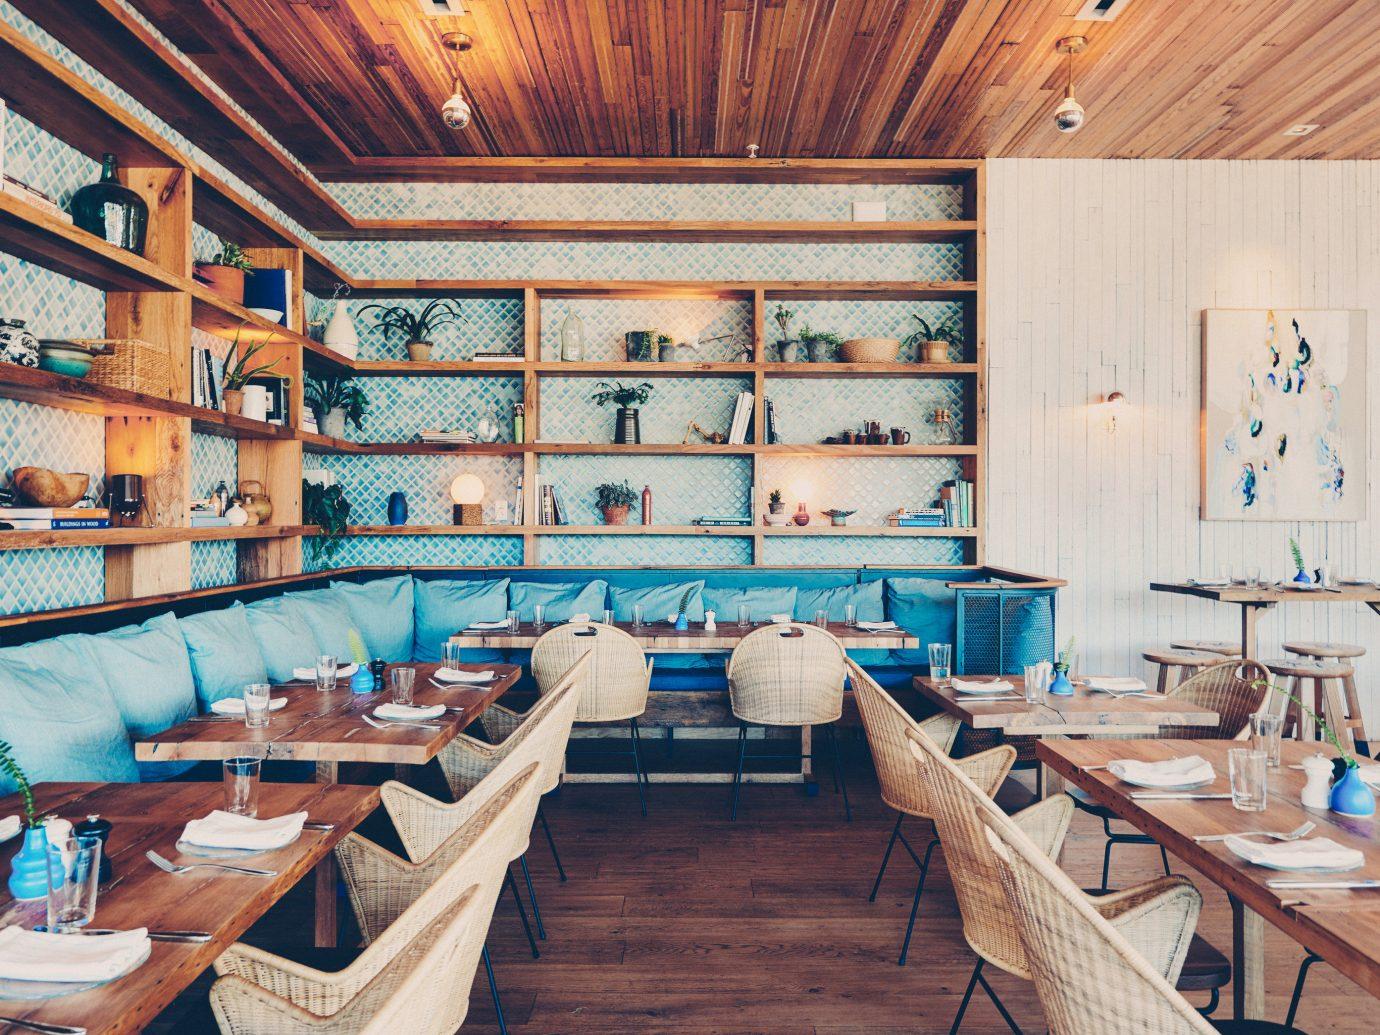 table indoor floor room restaurant wooden interior design estate function hall furniture wood